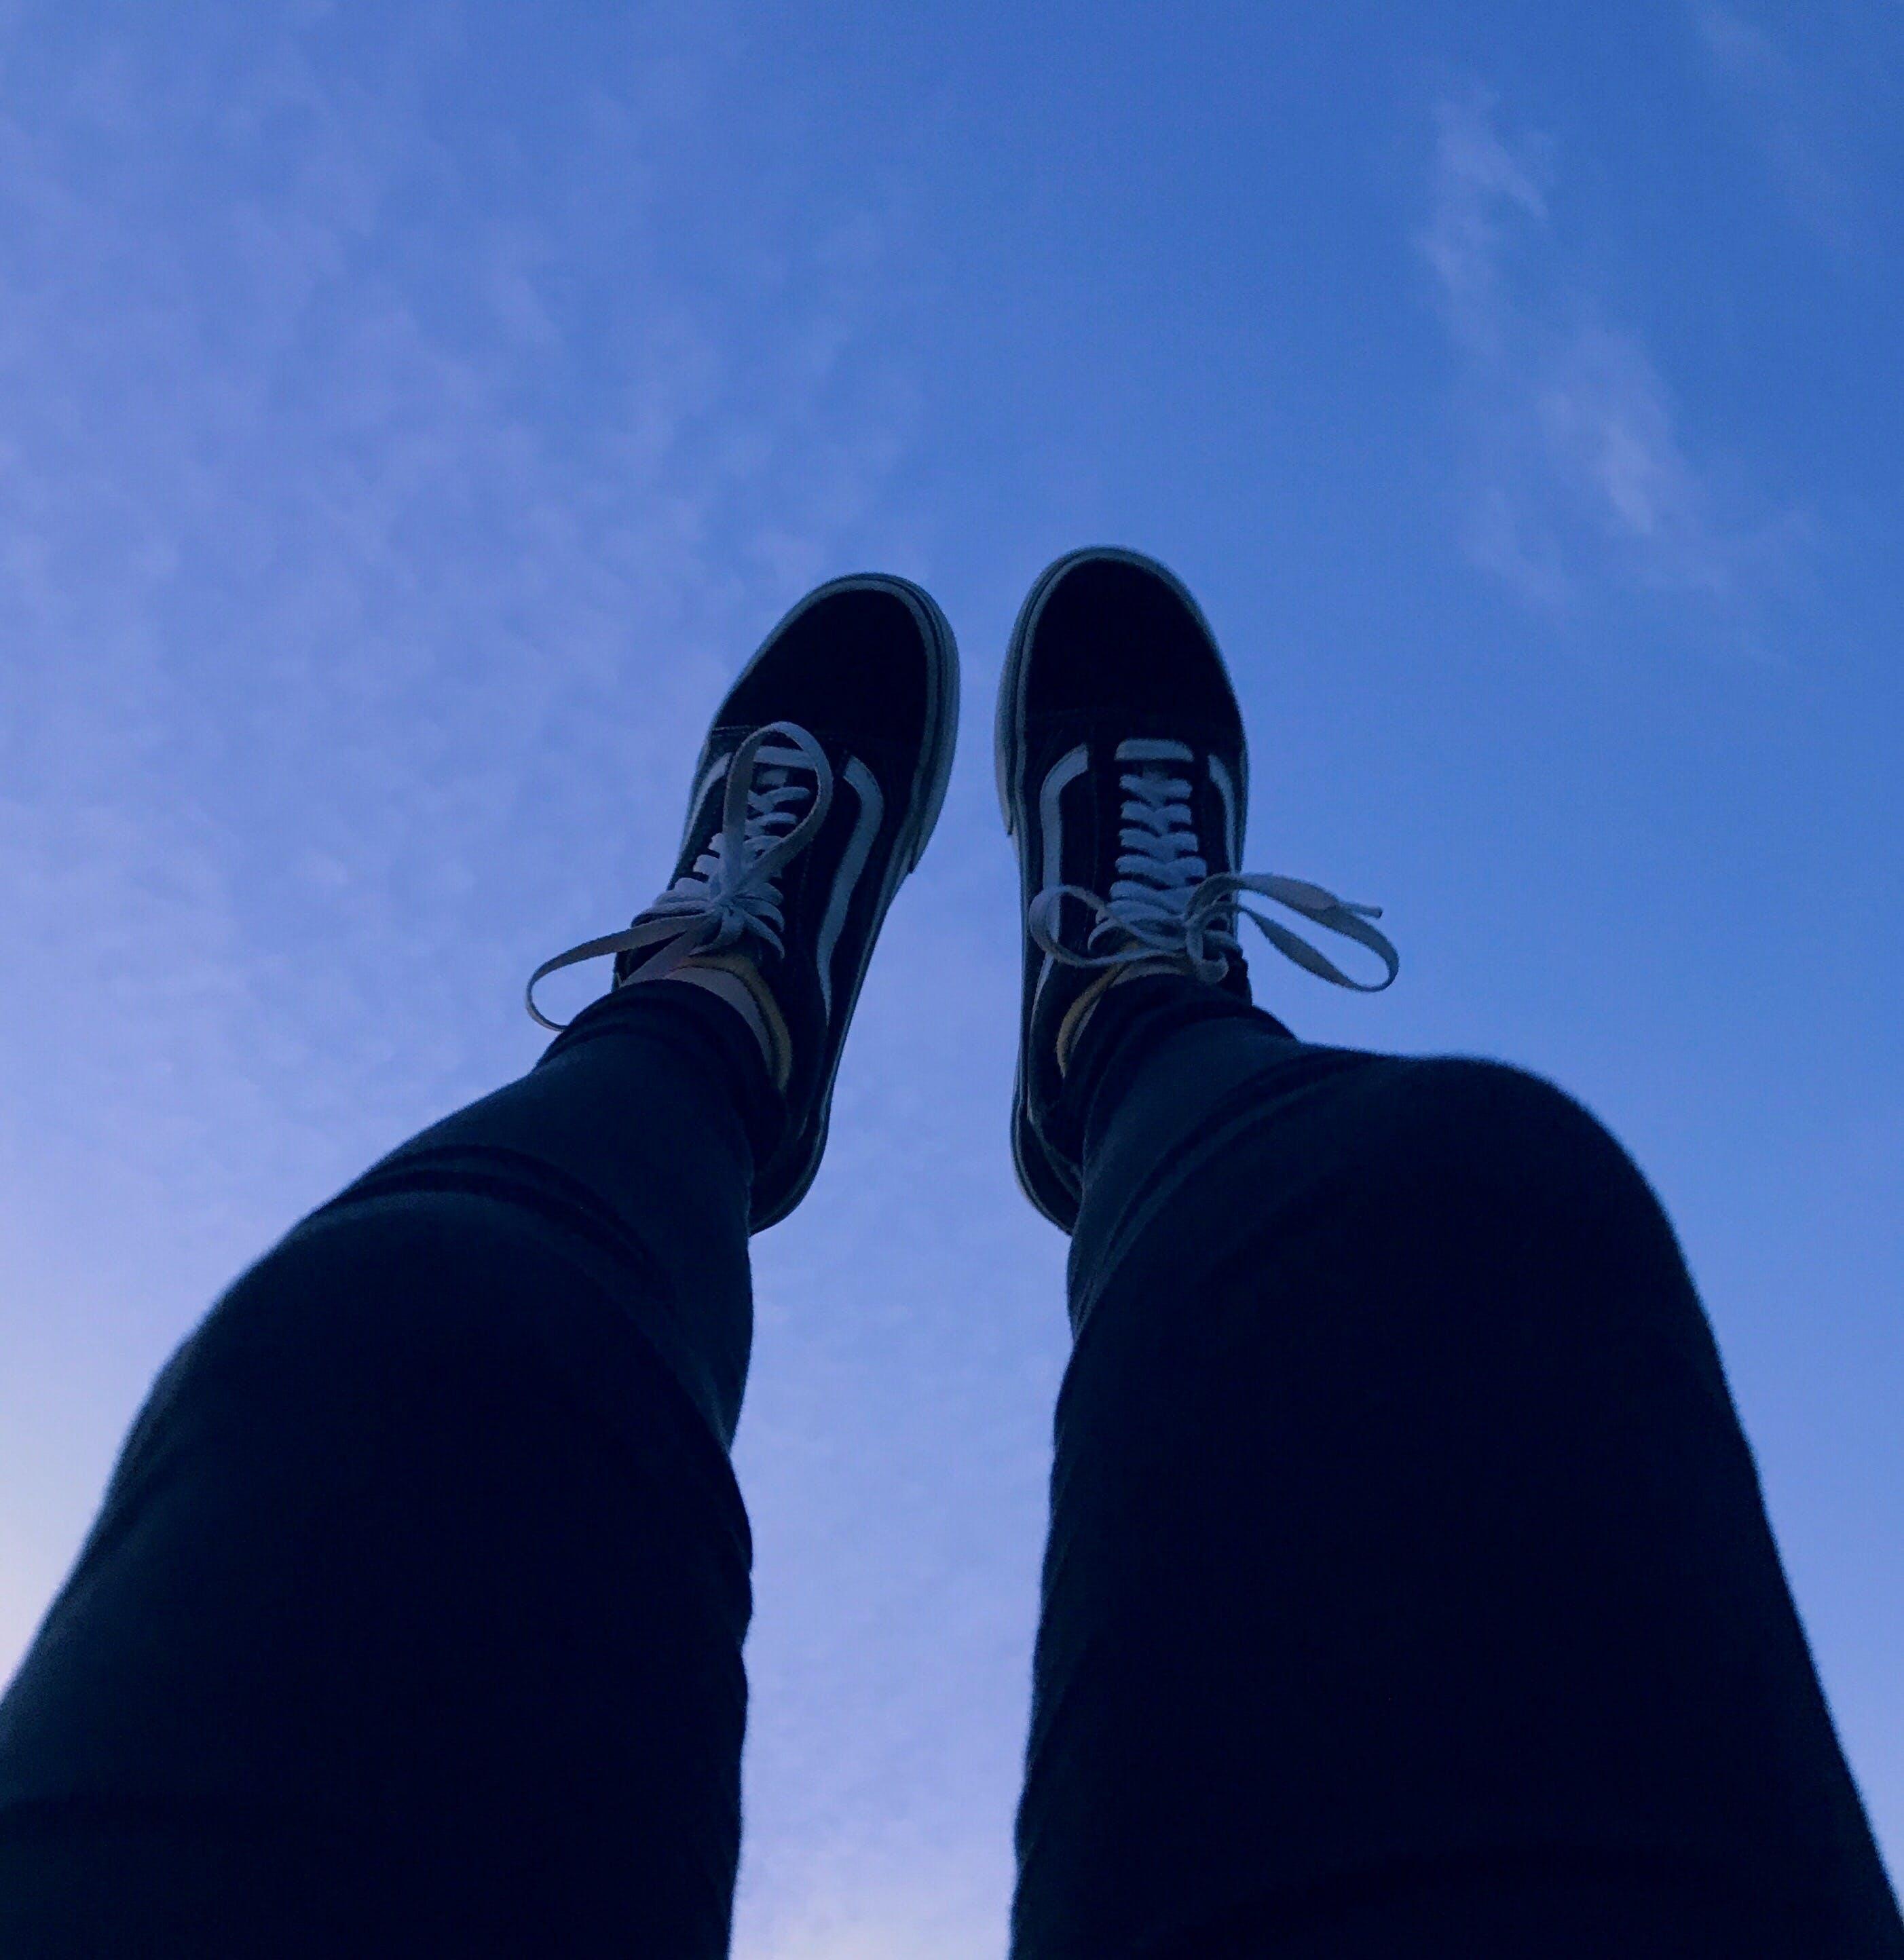 Person Wearing Vans Old Skool Sneakers Raising His Feet Pointing to They Sky